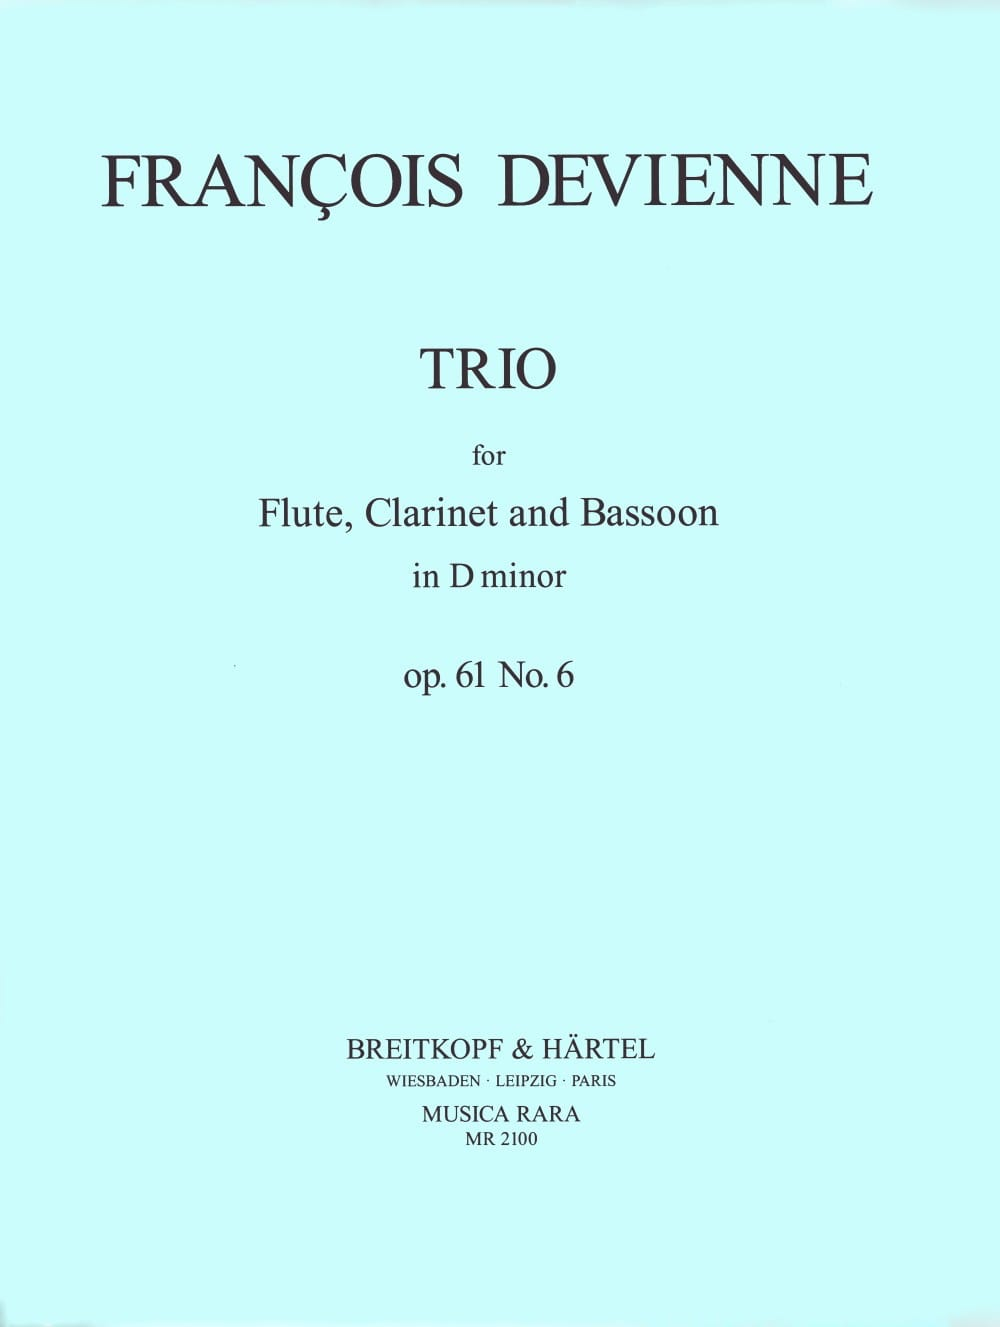 Trio in D minor, op. 61 n° 6 - Parts - DEVIENNE - laflutedepan.com